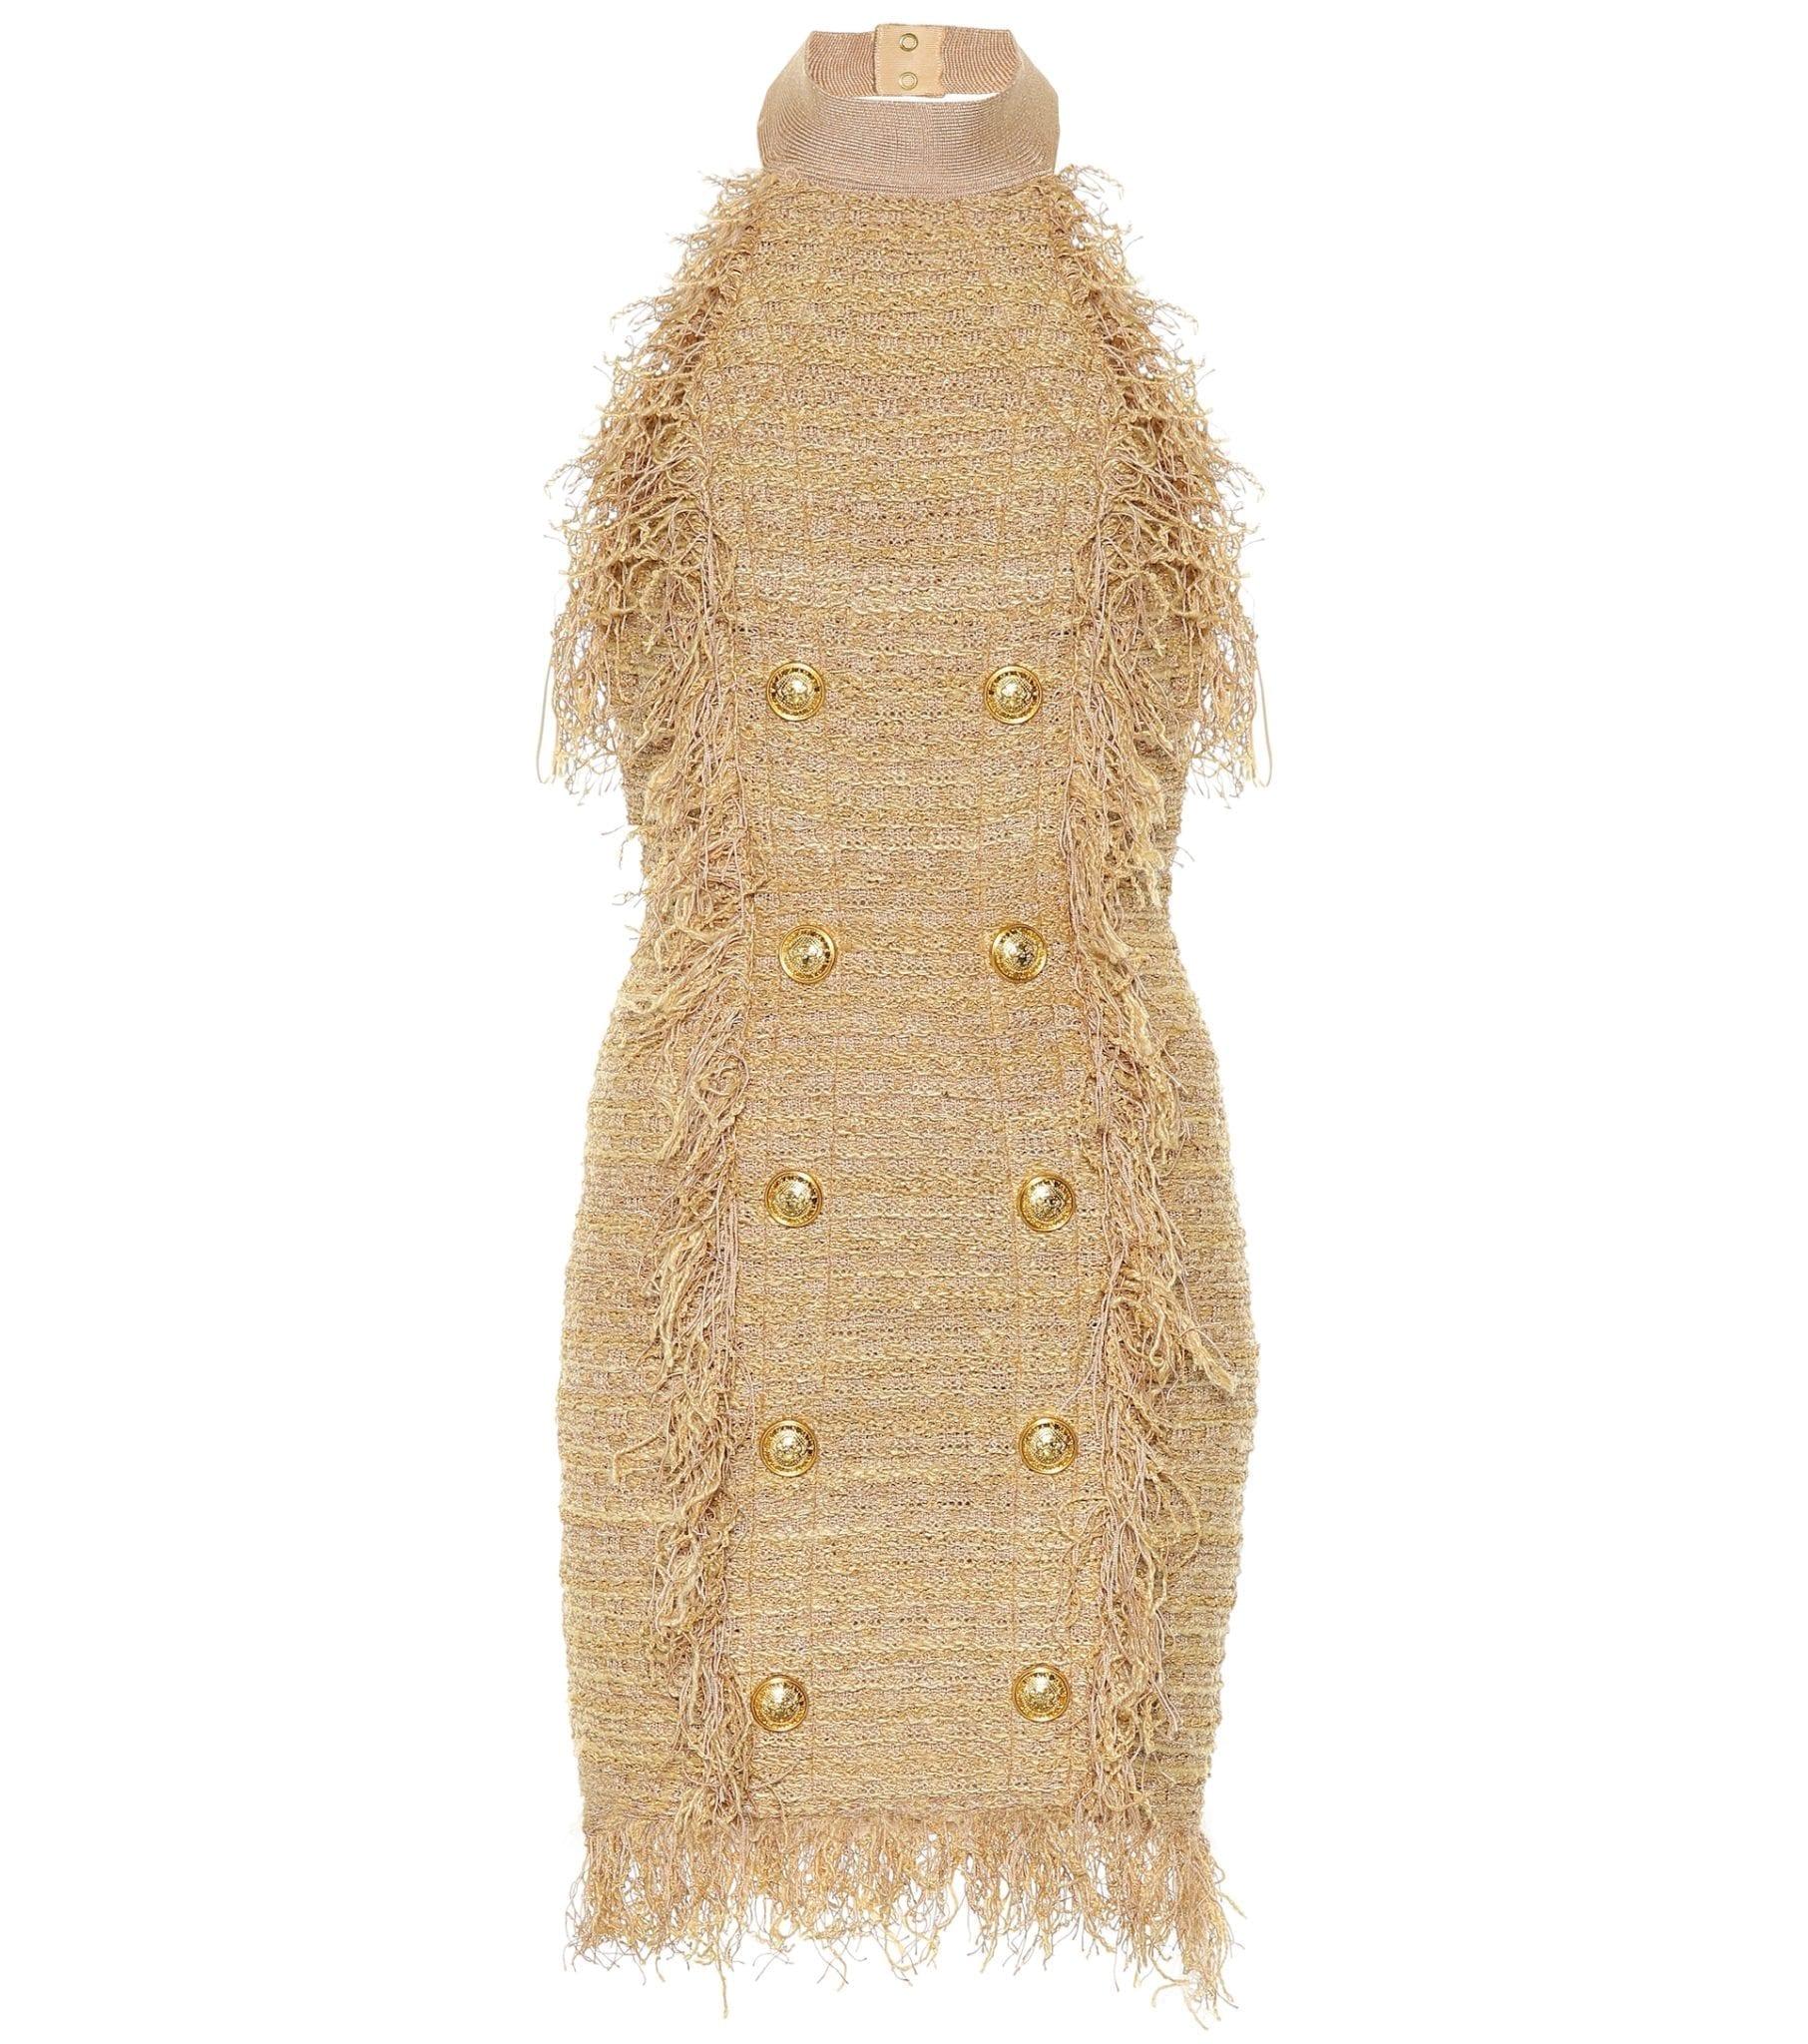 9c4dd0f1 BALMAIN Silk-Blend Tweed Mini Beige Dress - We Select Dresses